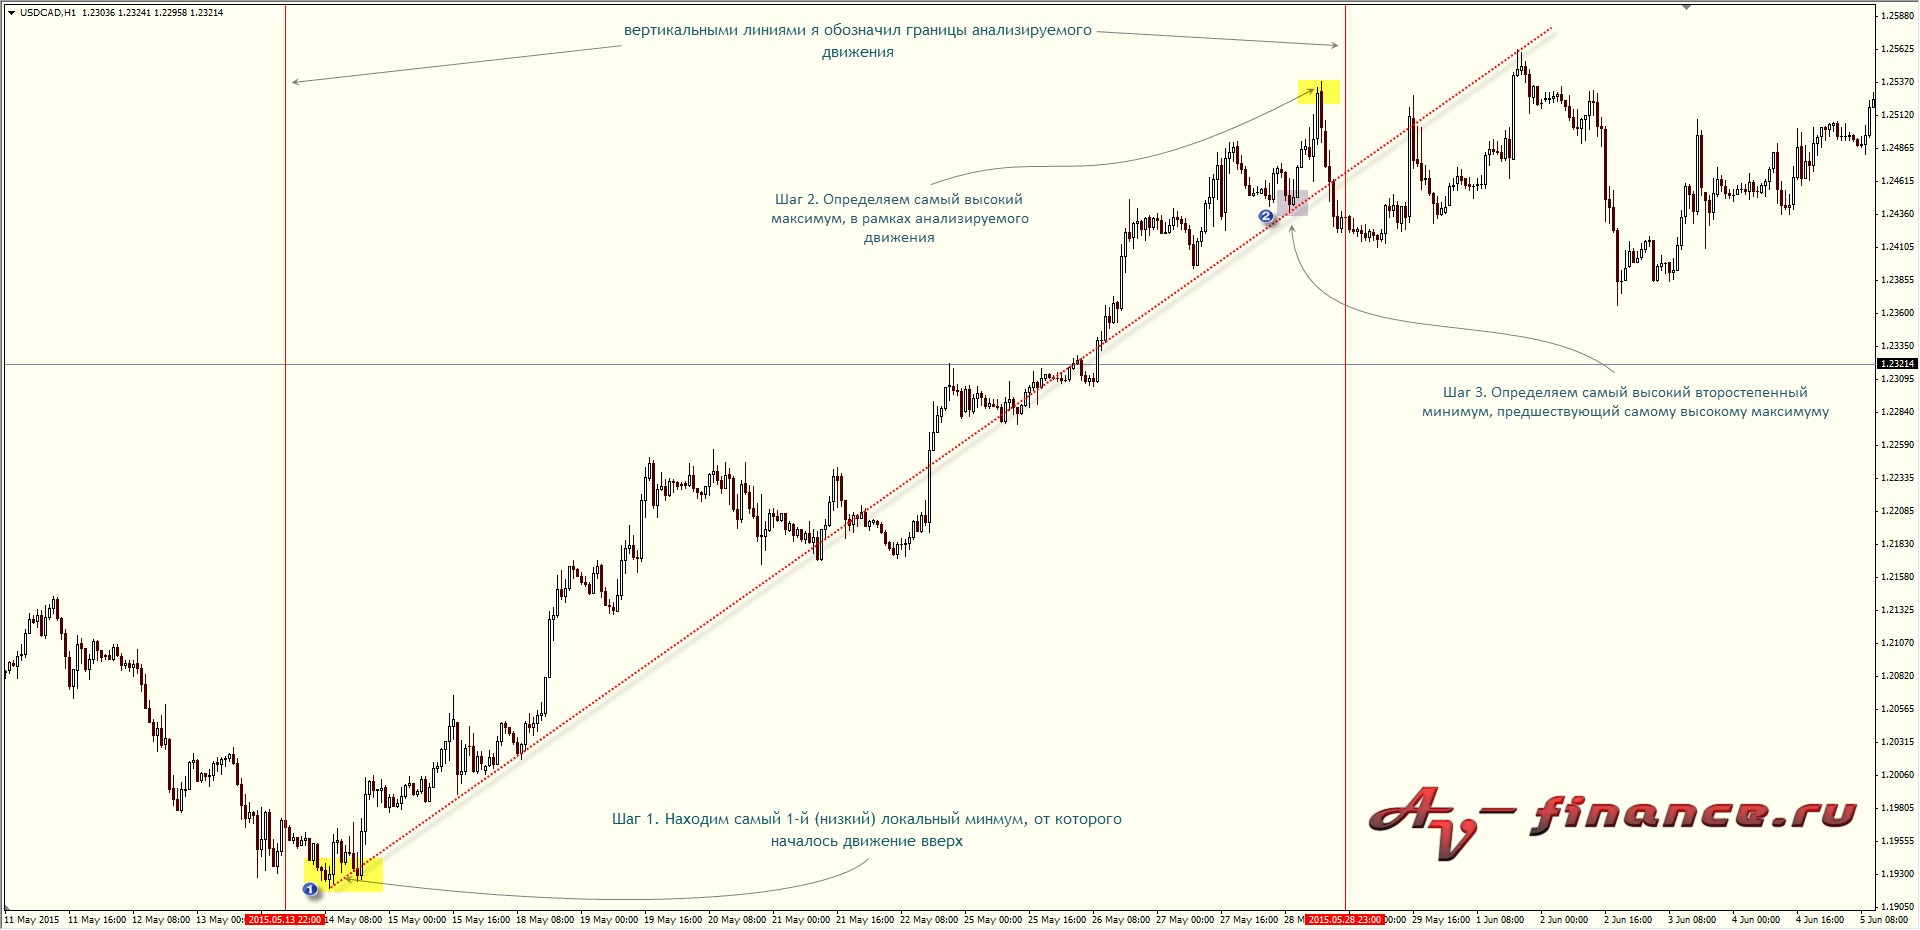 algoritm-postroenija-linij-trenda-metodu-sperandeo-1 Фигуры разворота и продолжения тренда